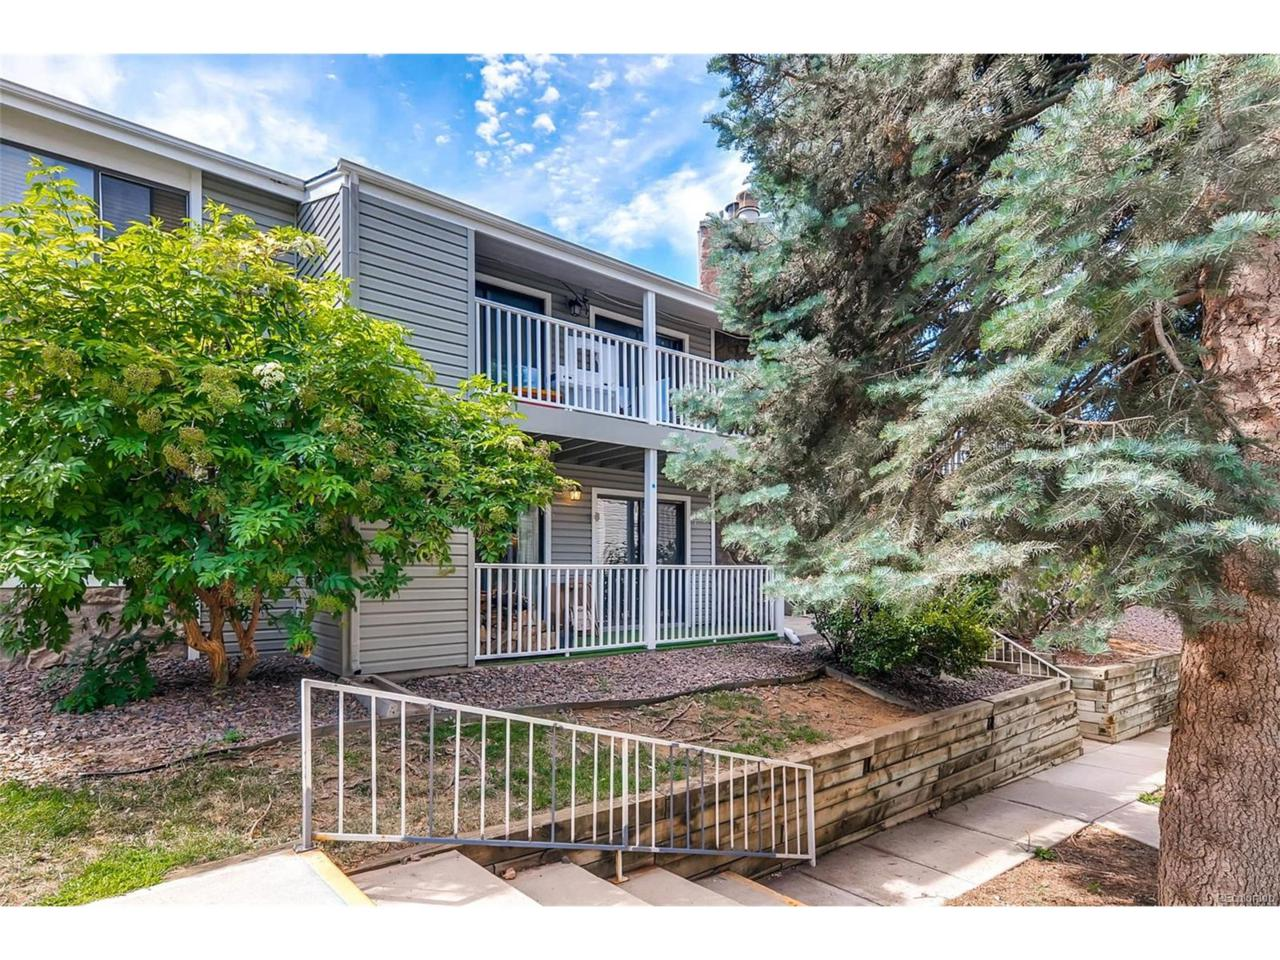 943 S Zeno Way #107, Aurora, CO 80017 (MLS #6339063) :: 8z Real Estate